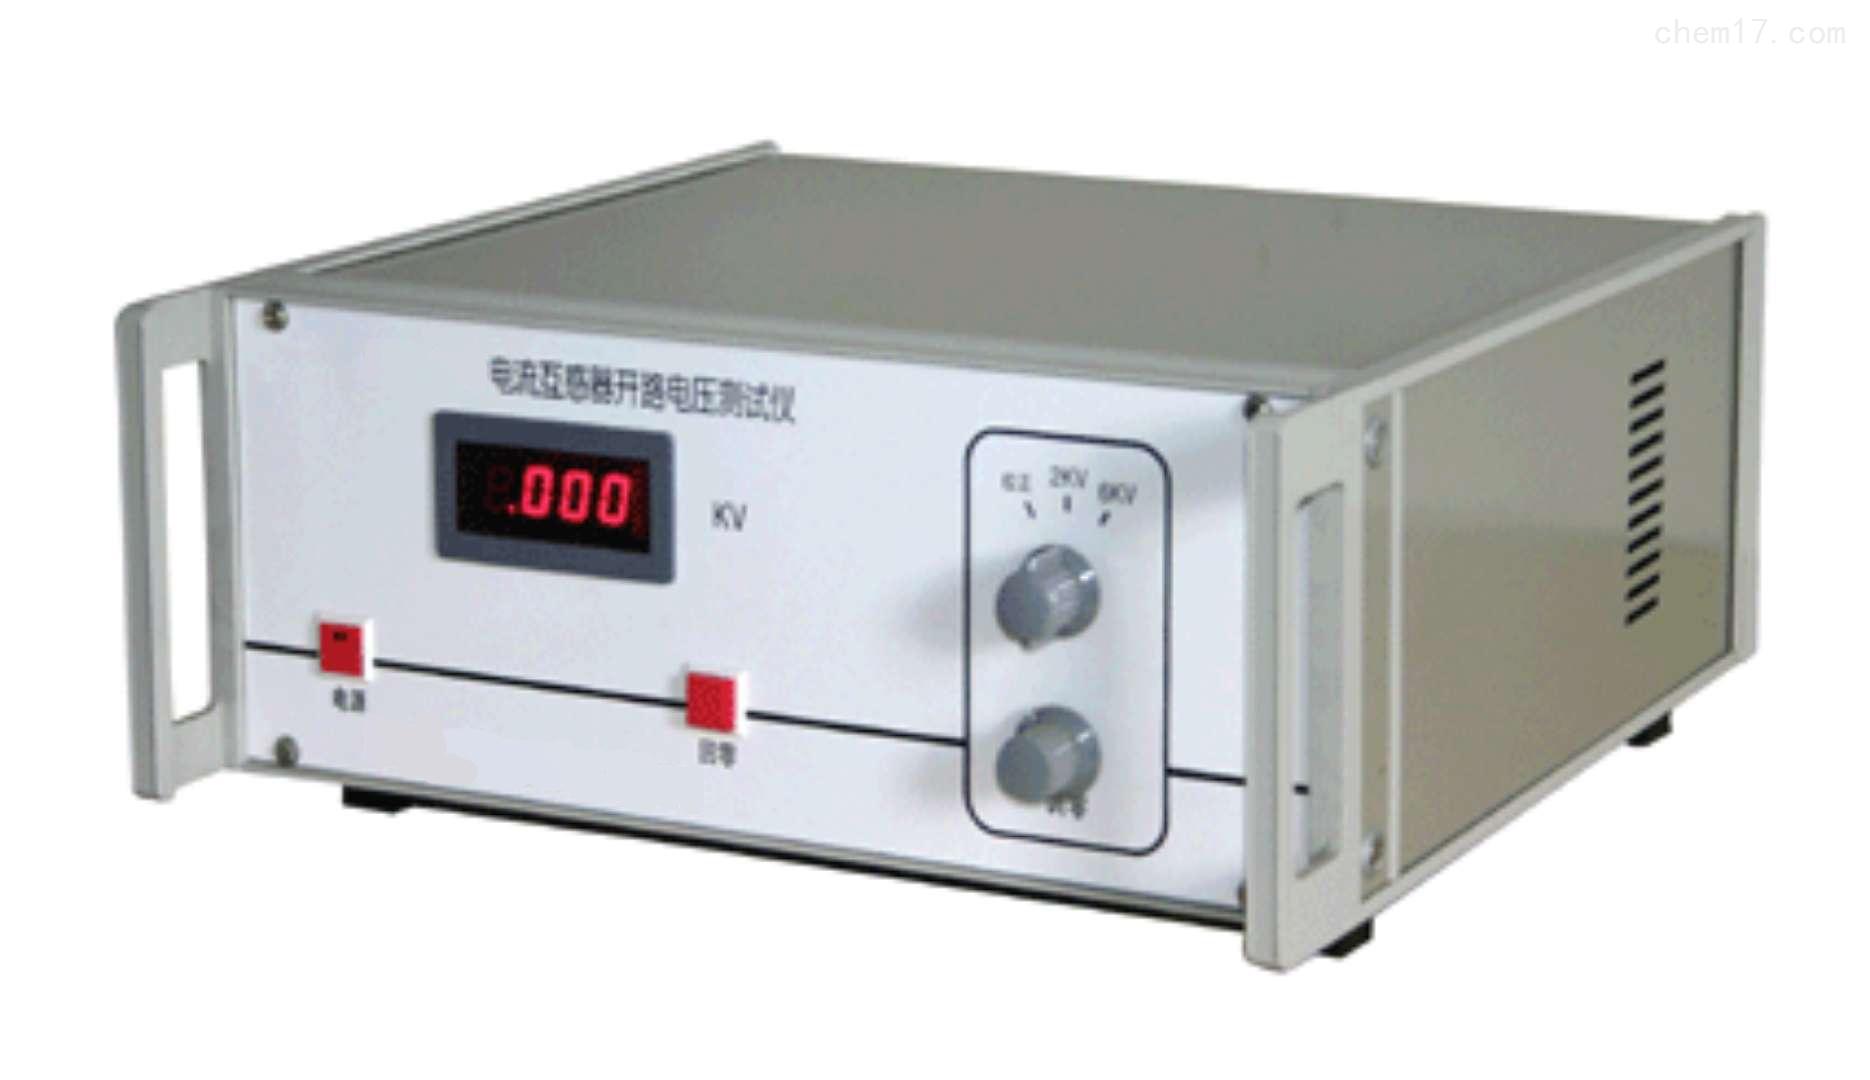 HKY-2005互感器开路电压测试仪厂商推荐